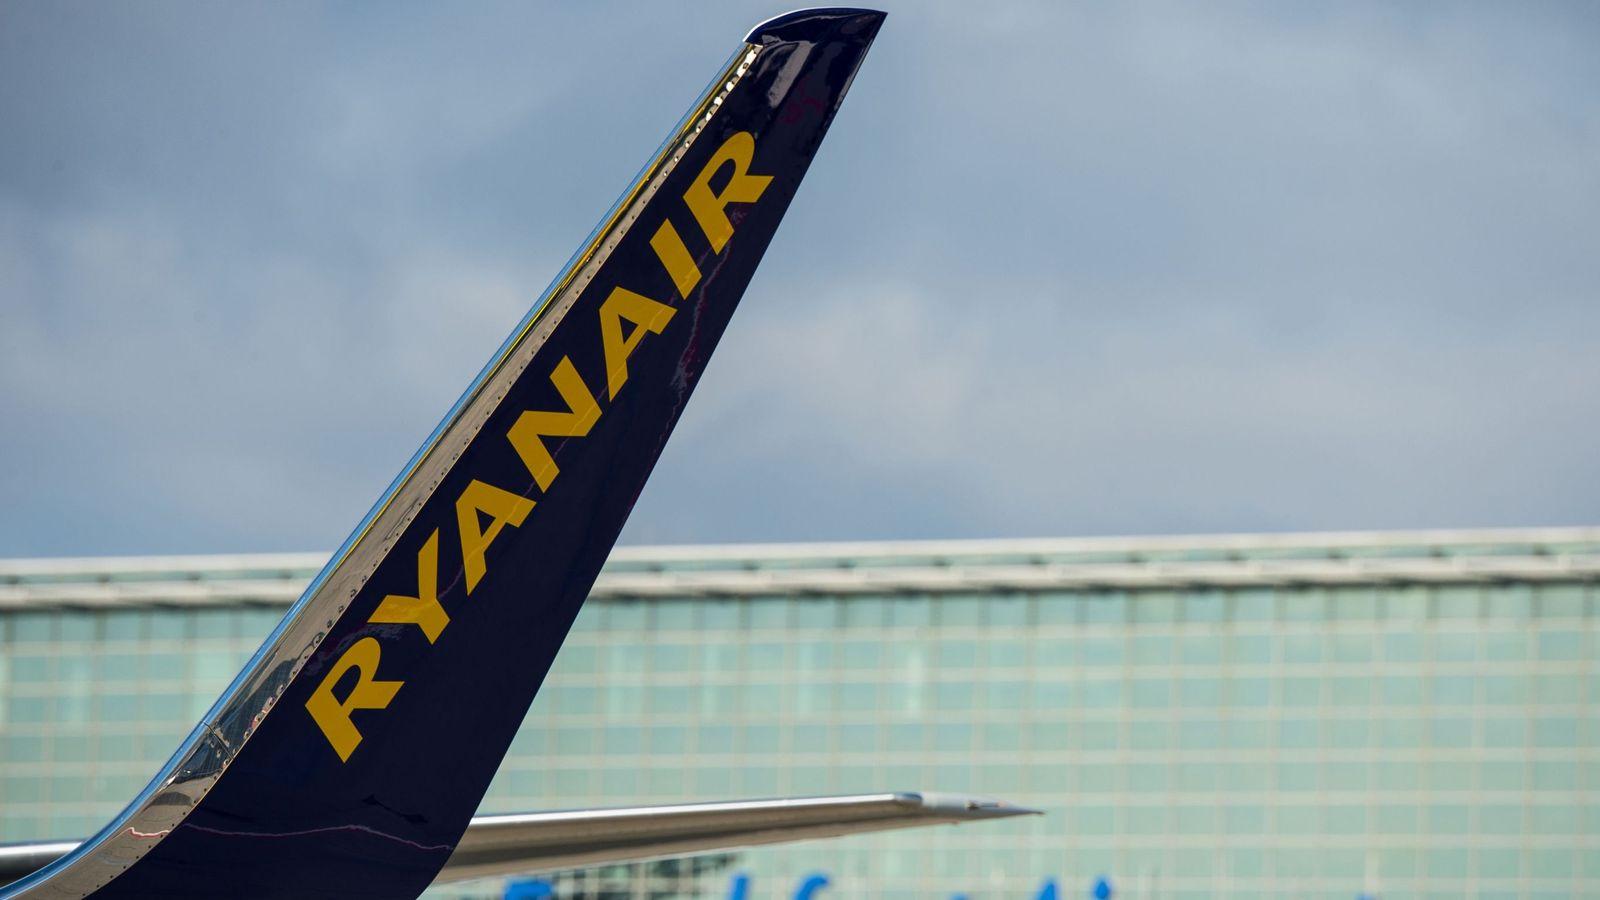 More Ryanair cancellations loom as German pilots vote to ...